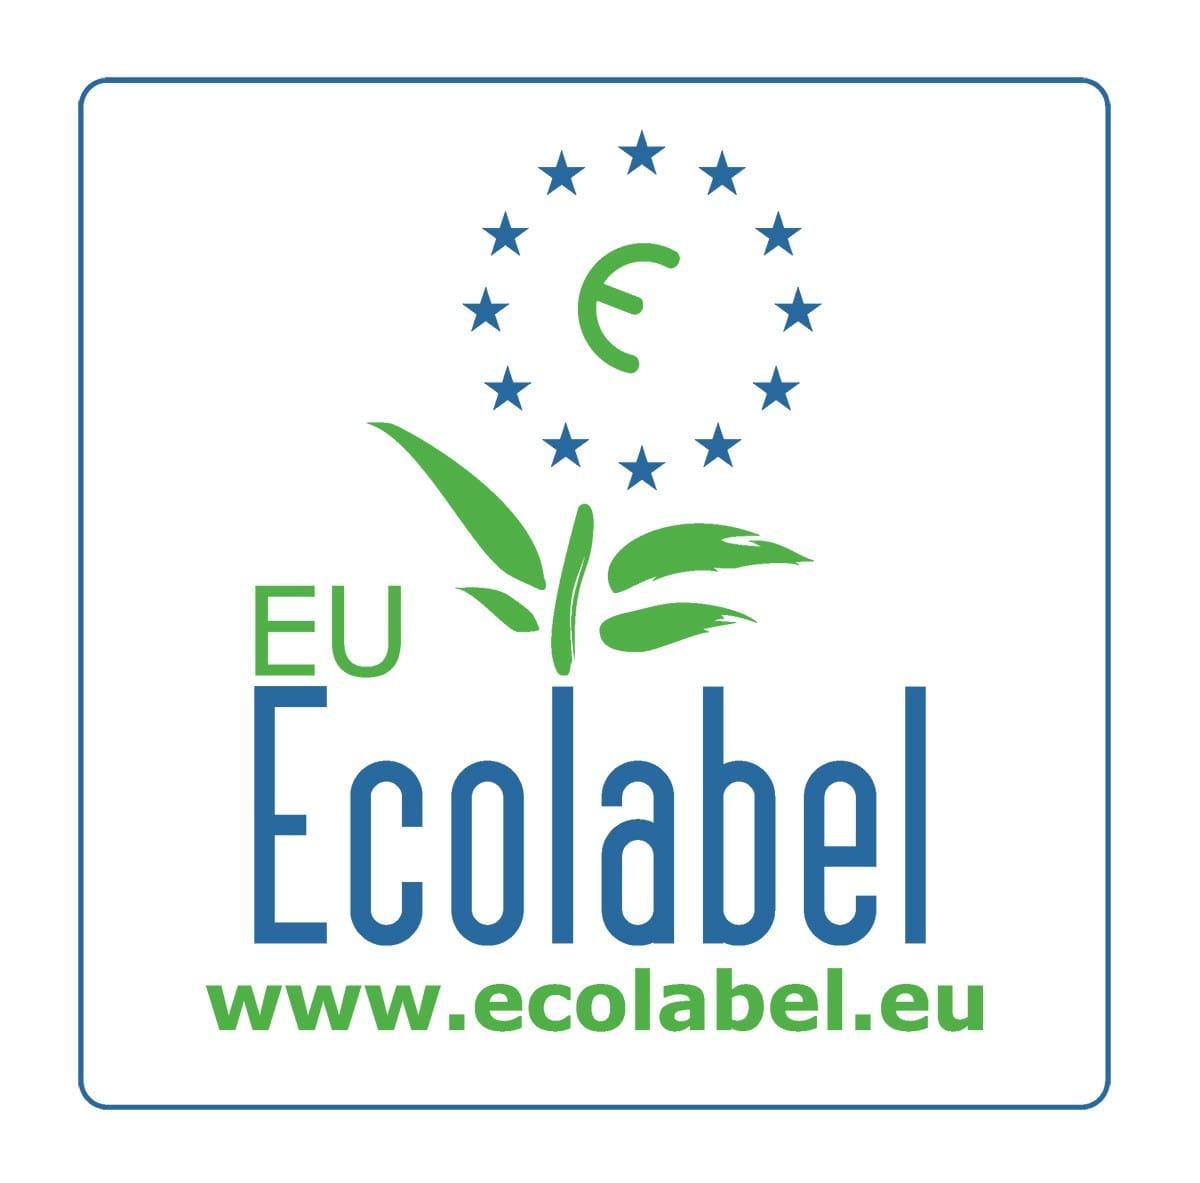 EU_kukka_Ecolabel_logo.jpeg